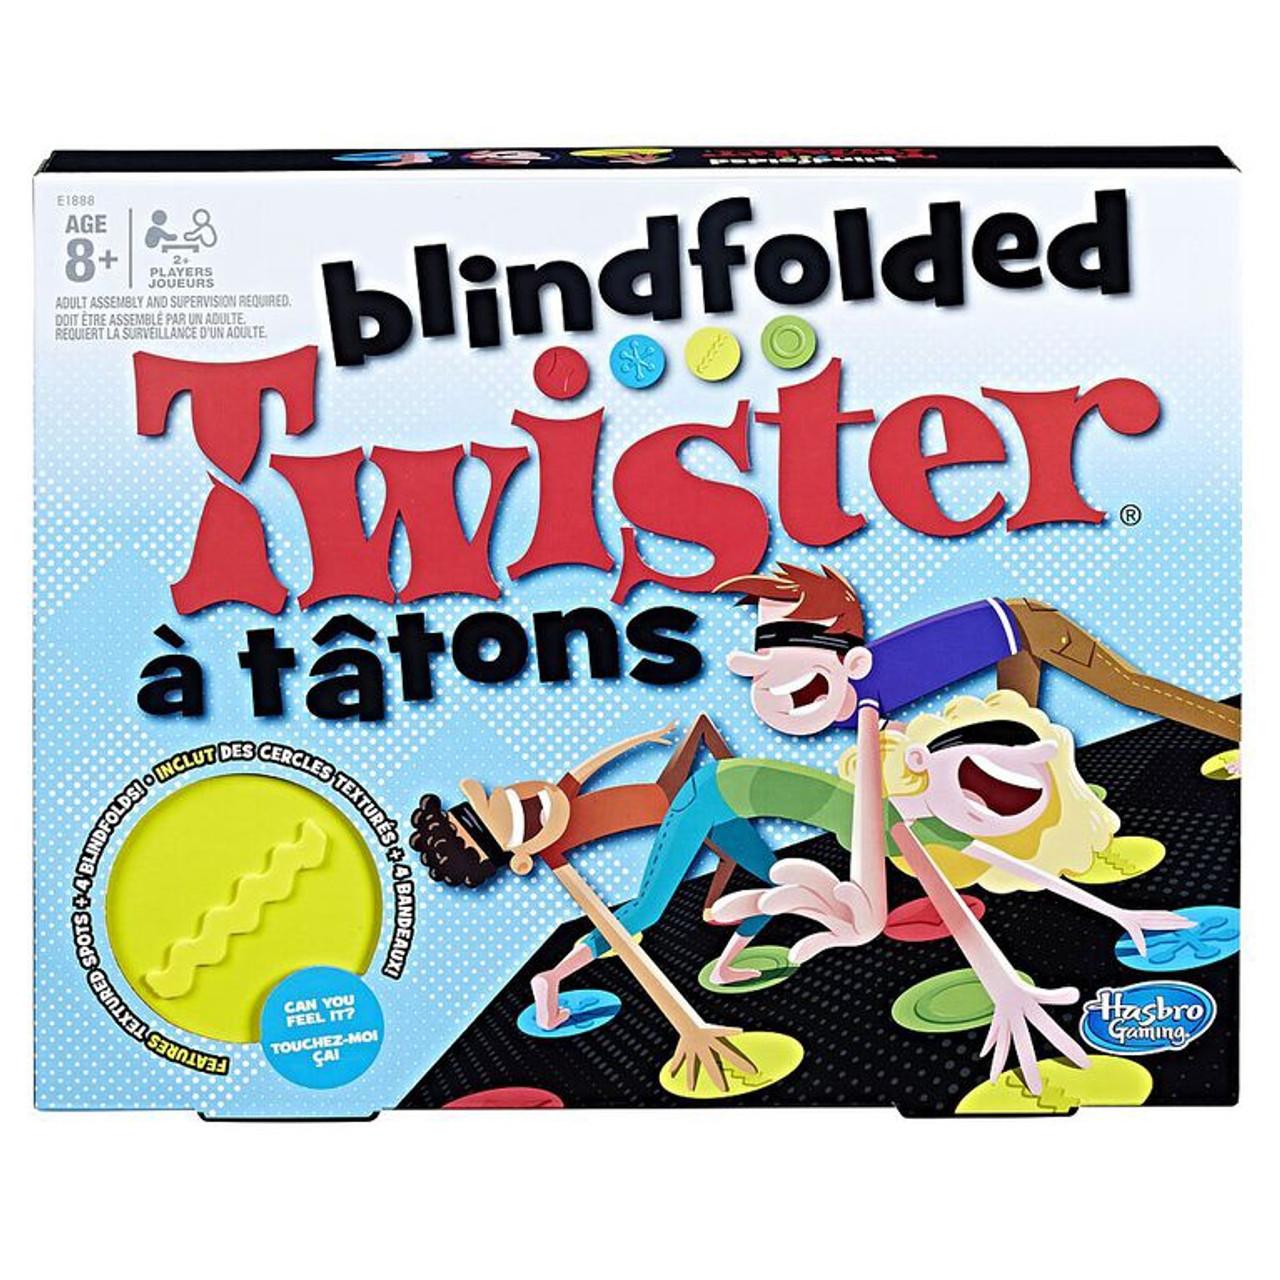 TWISTER BLINDFOLDED GAME